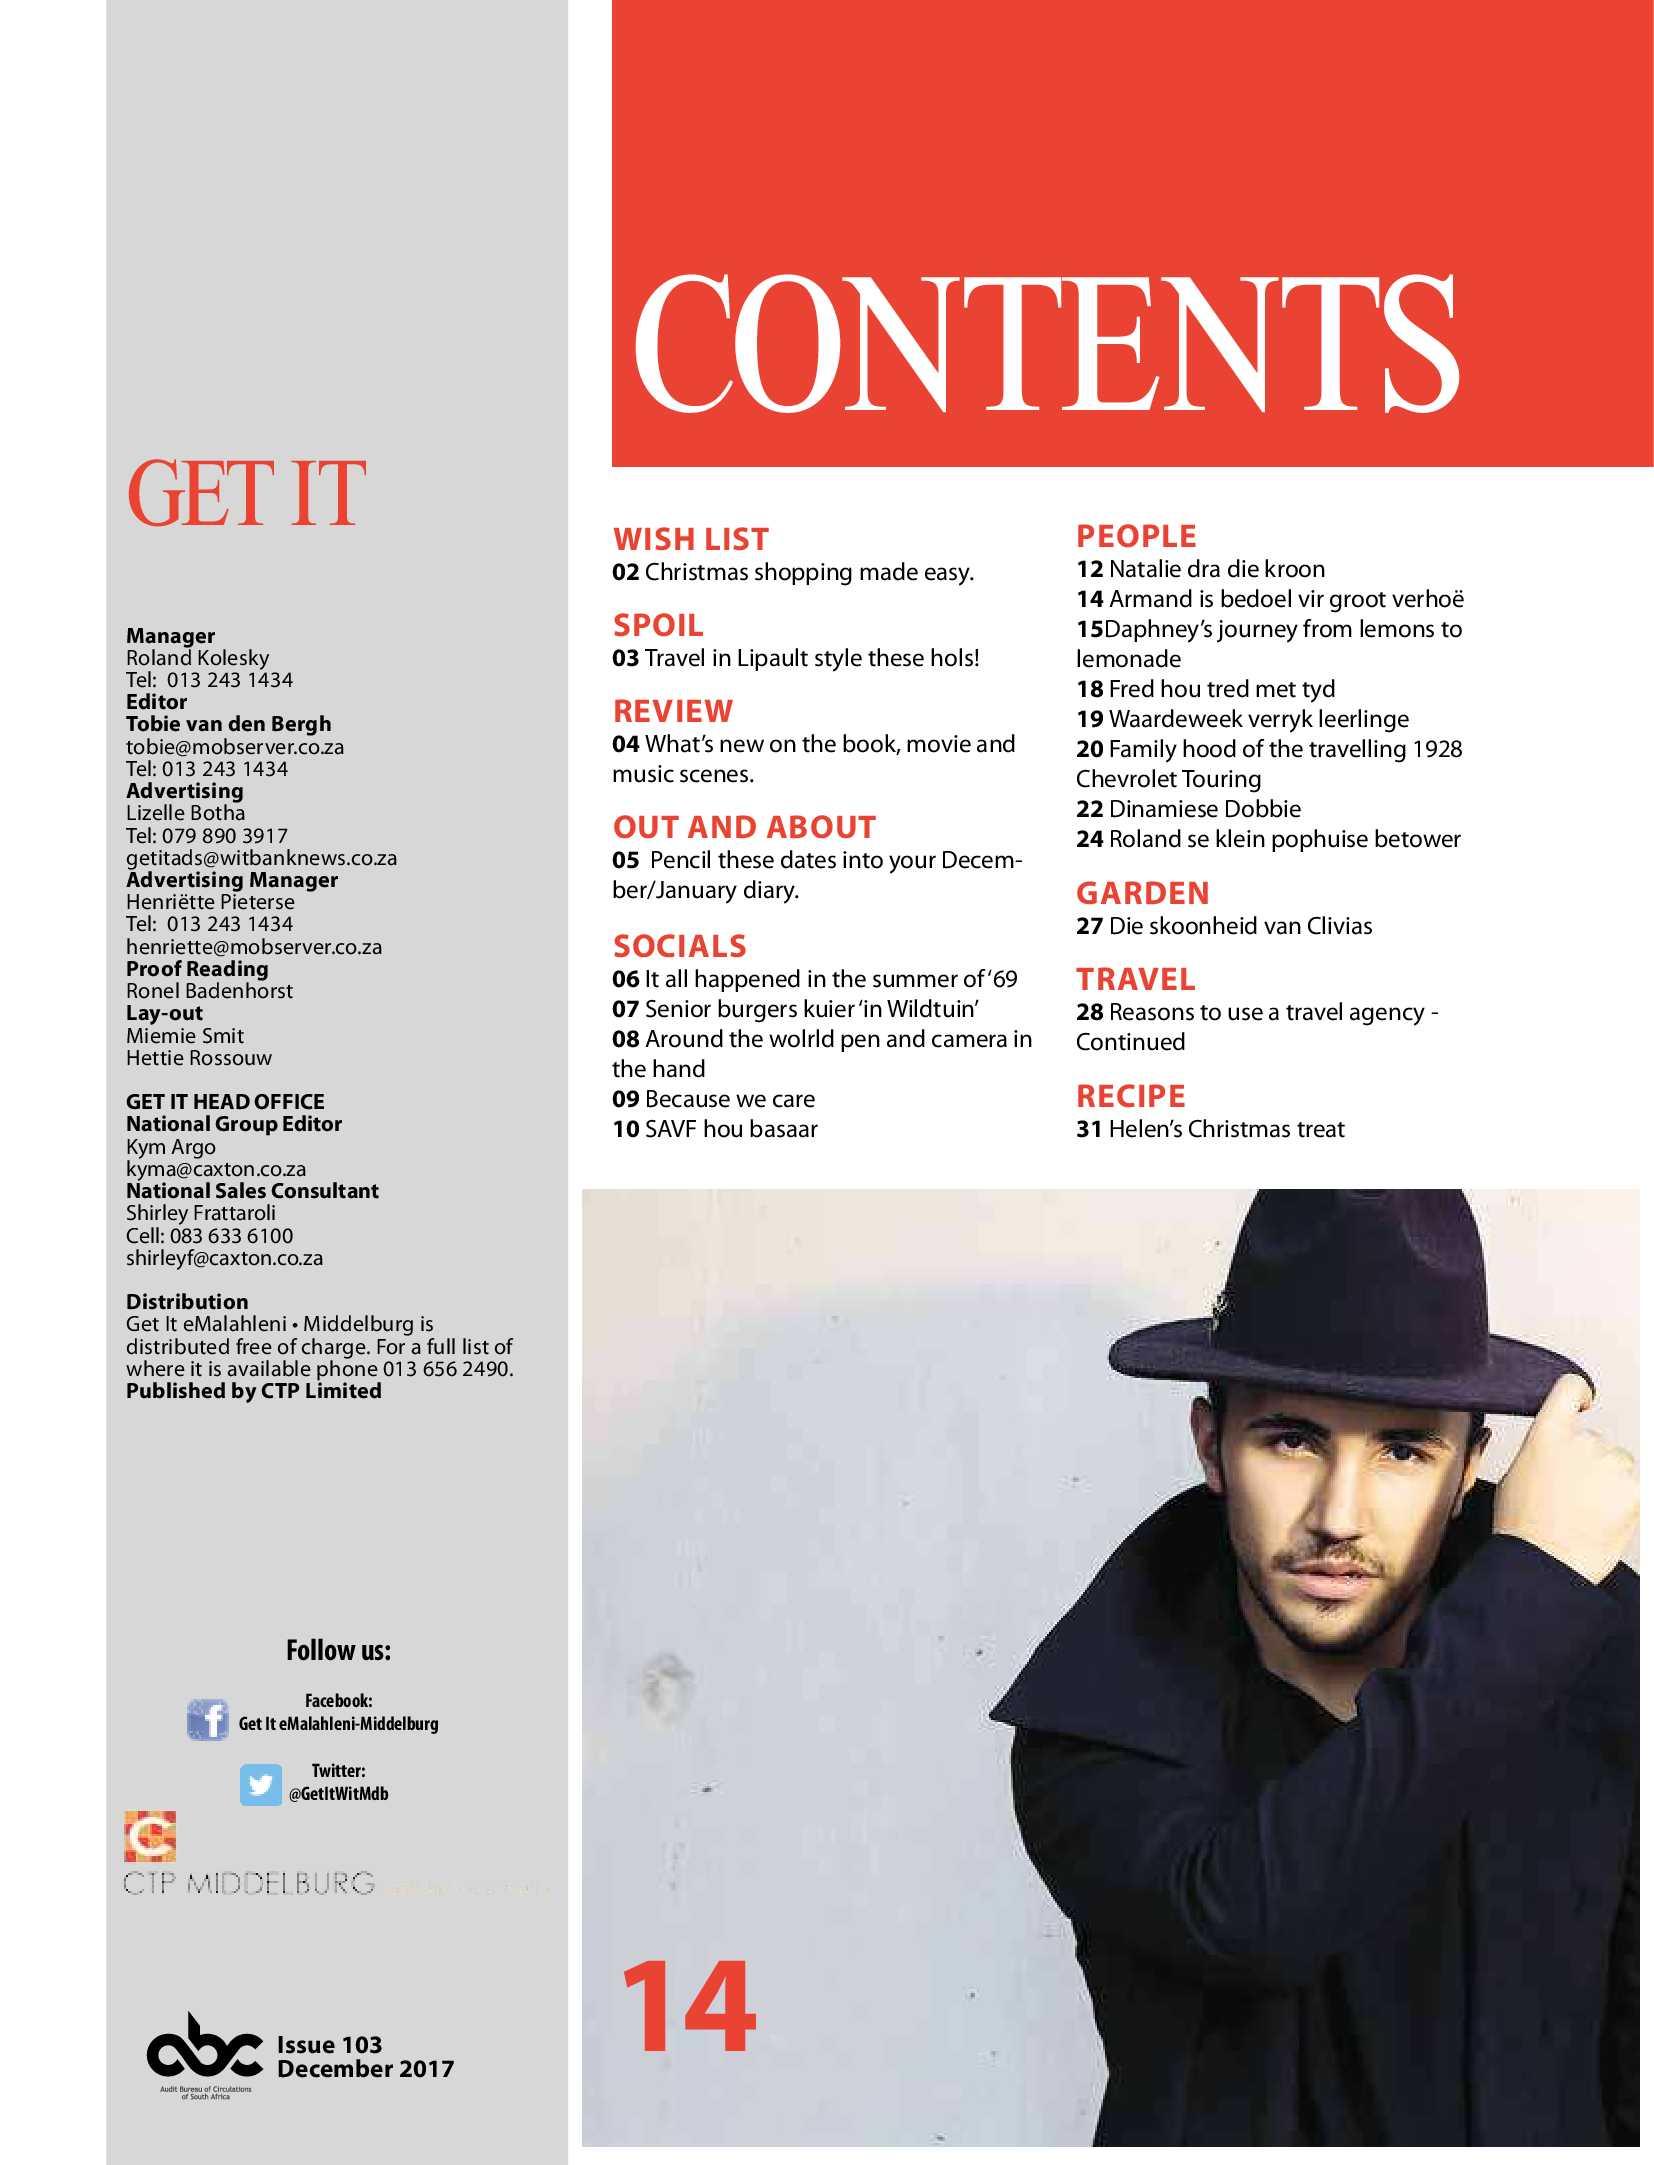 get-mb-des-2017-epapers-page-3